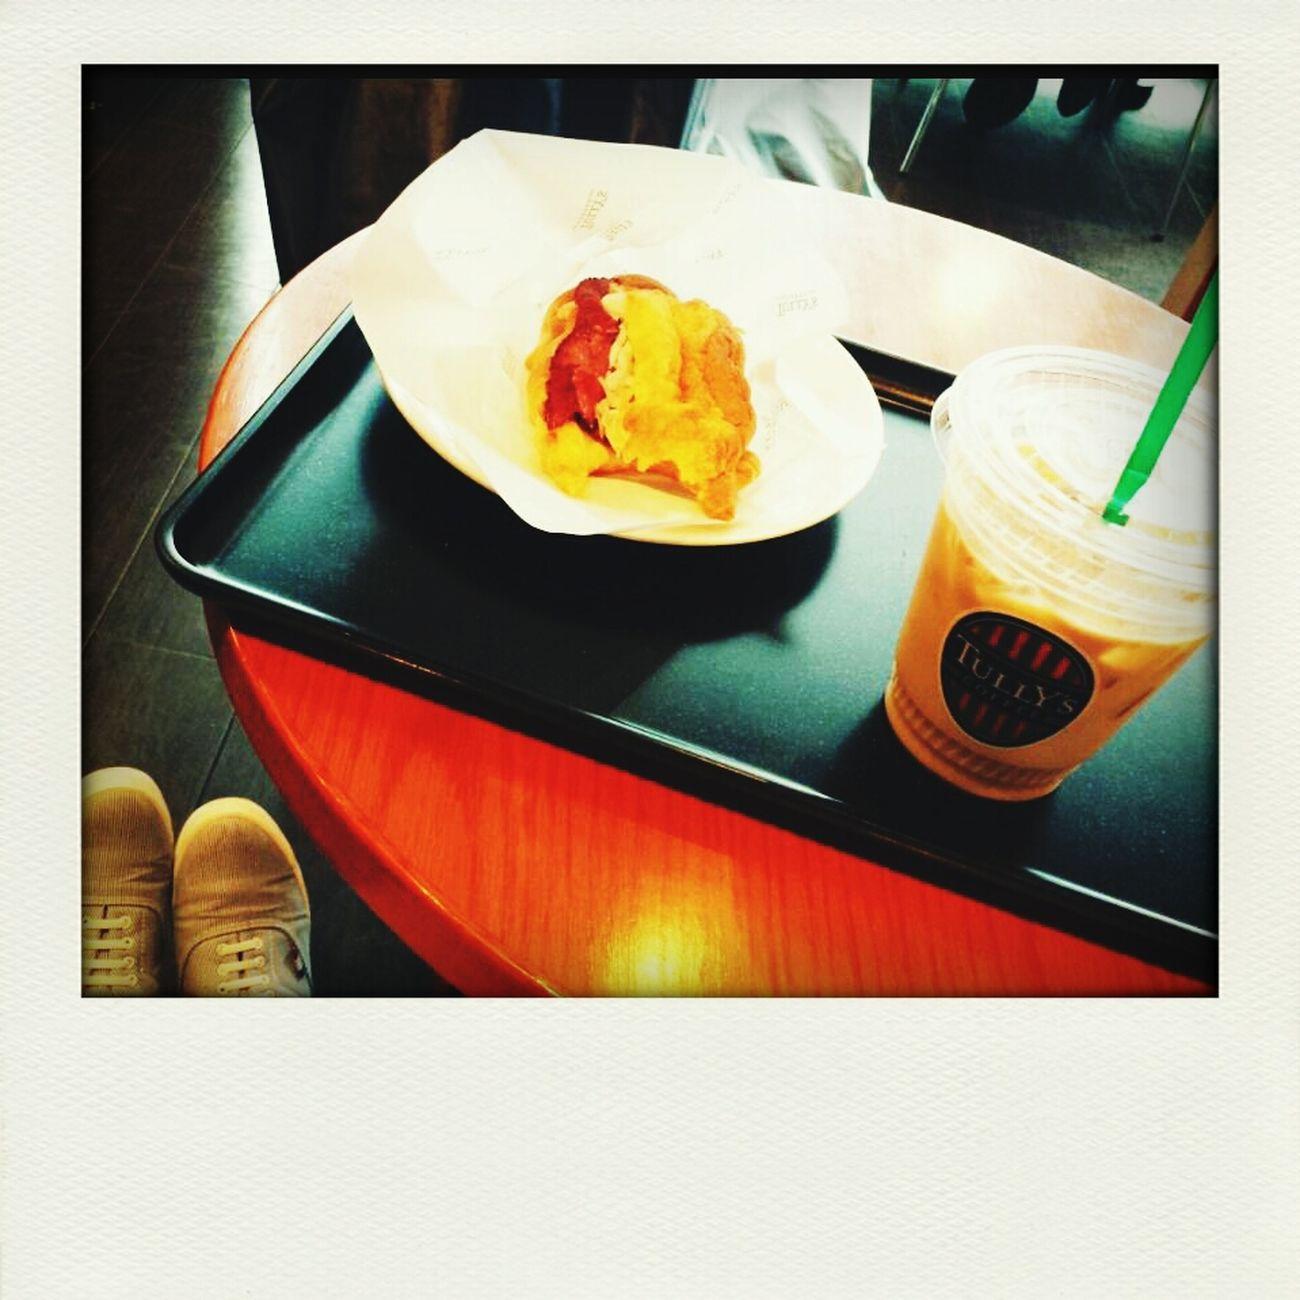 break time at tokyo bay area.